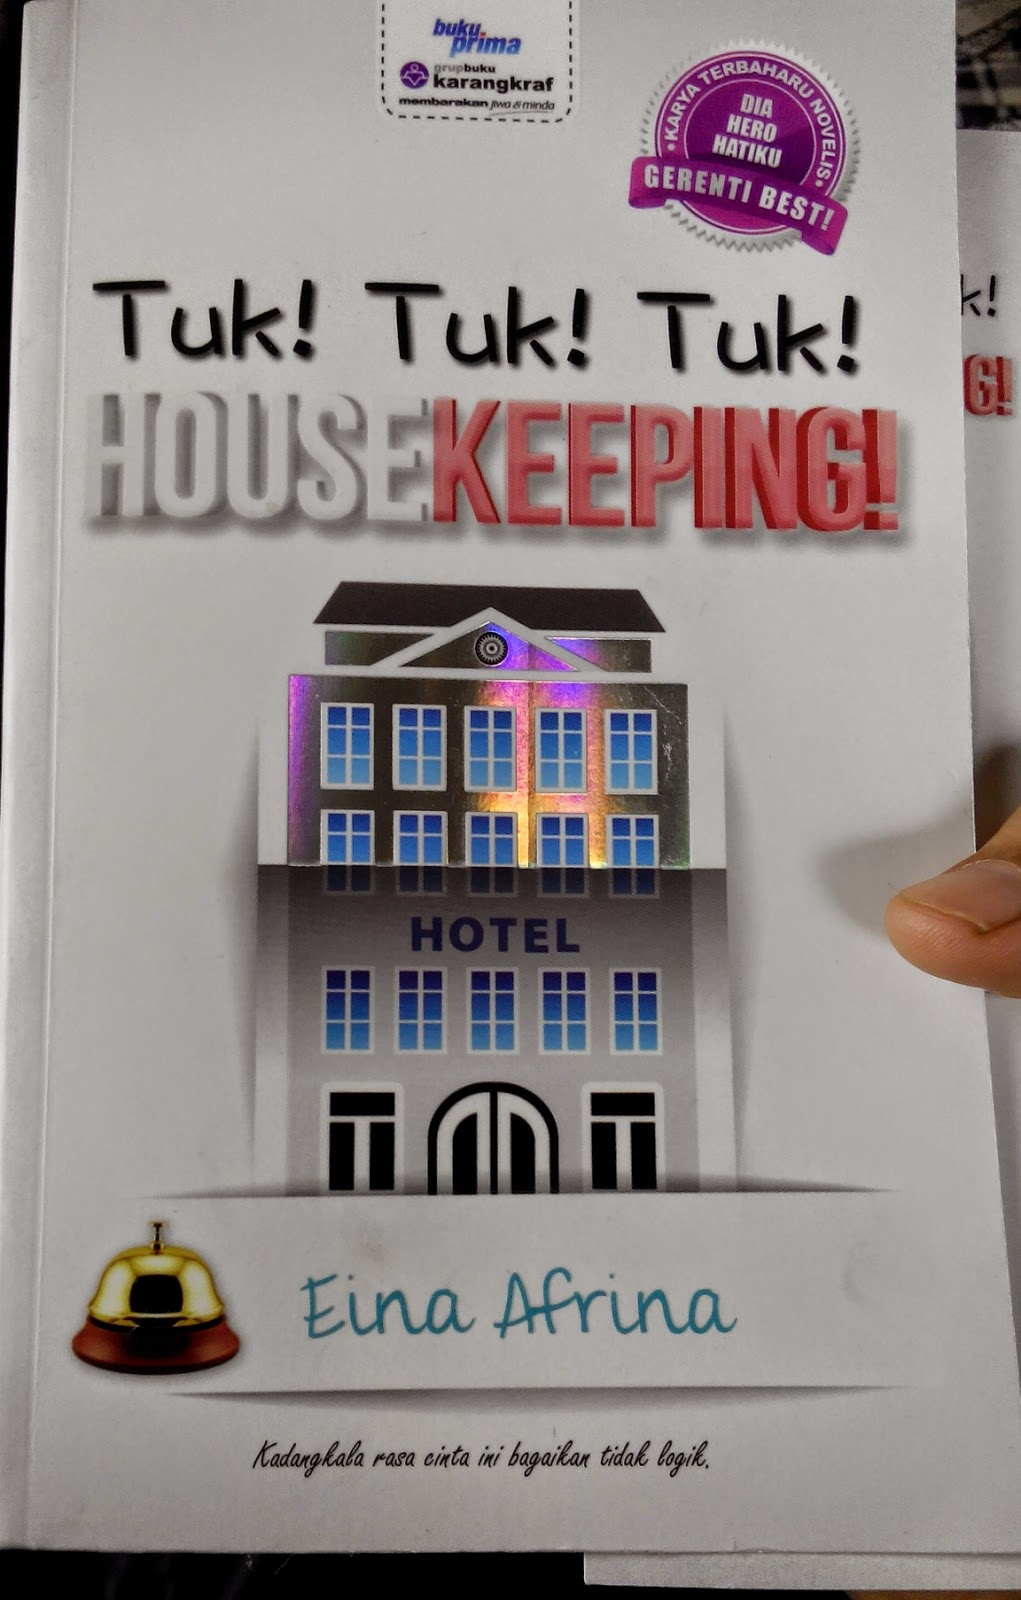 Review Novel: Tuk! Tuk! Tuk! HOUSEKEEPING!